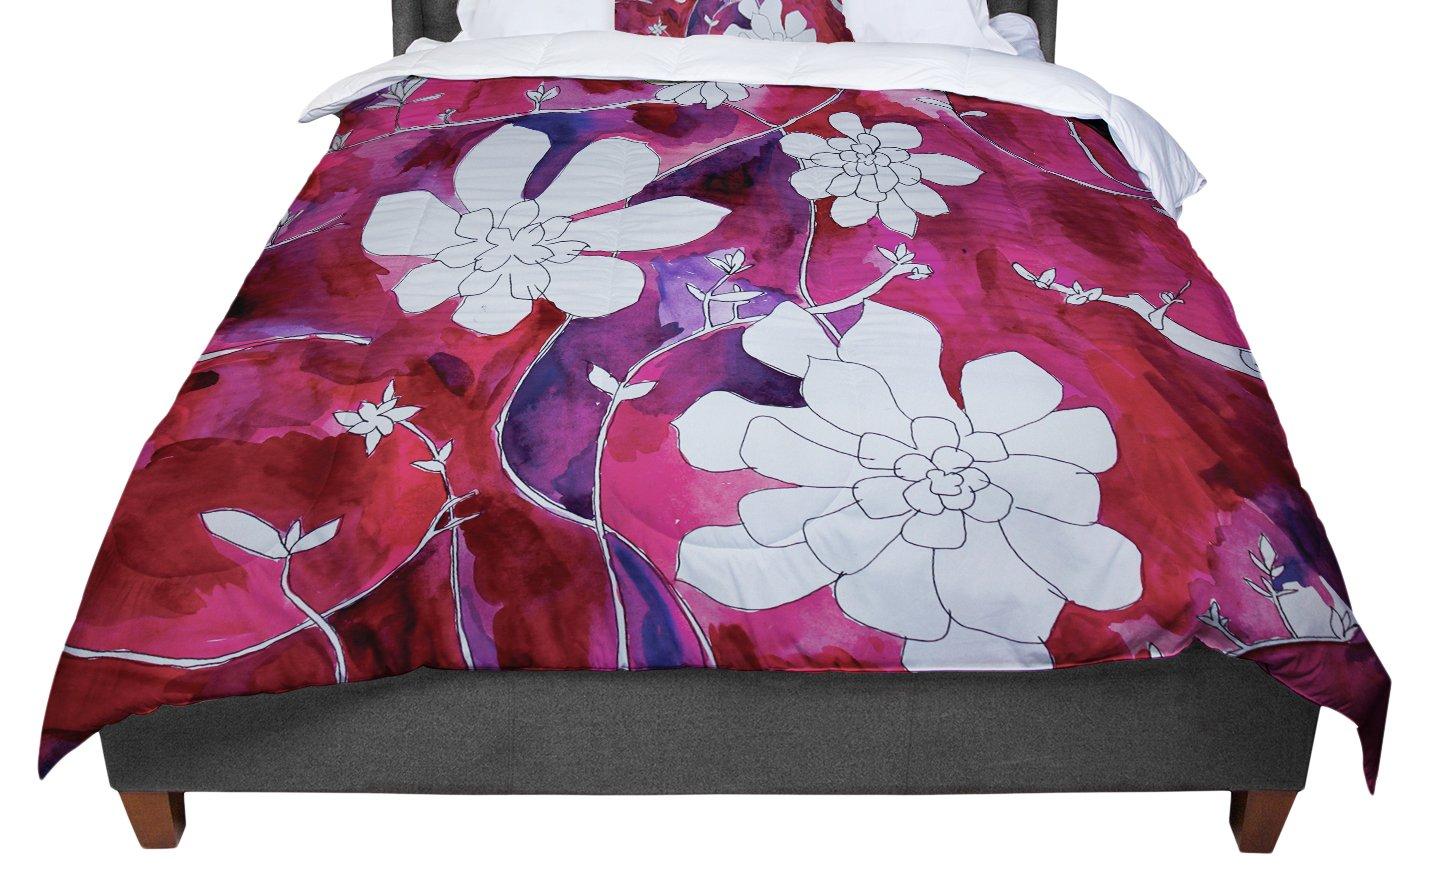 KESS InHouse Theresa Giolzetti ''Succulent Dance II'' Twin Comforter, 68'' X 88''